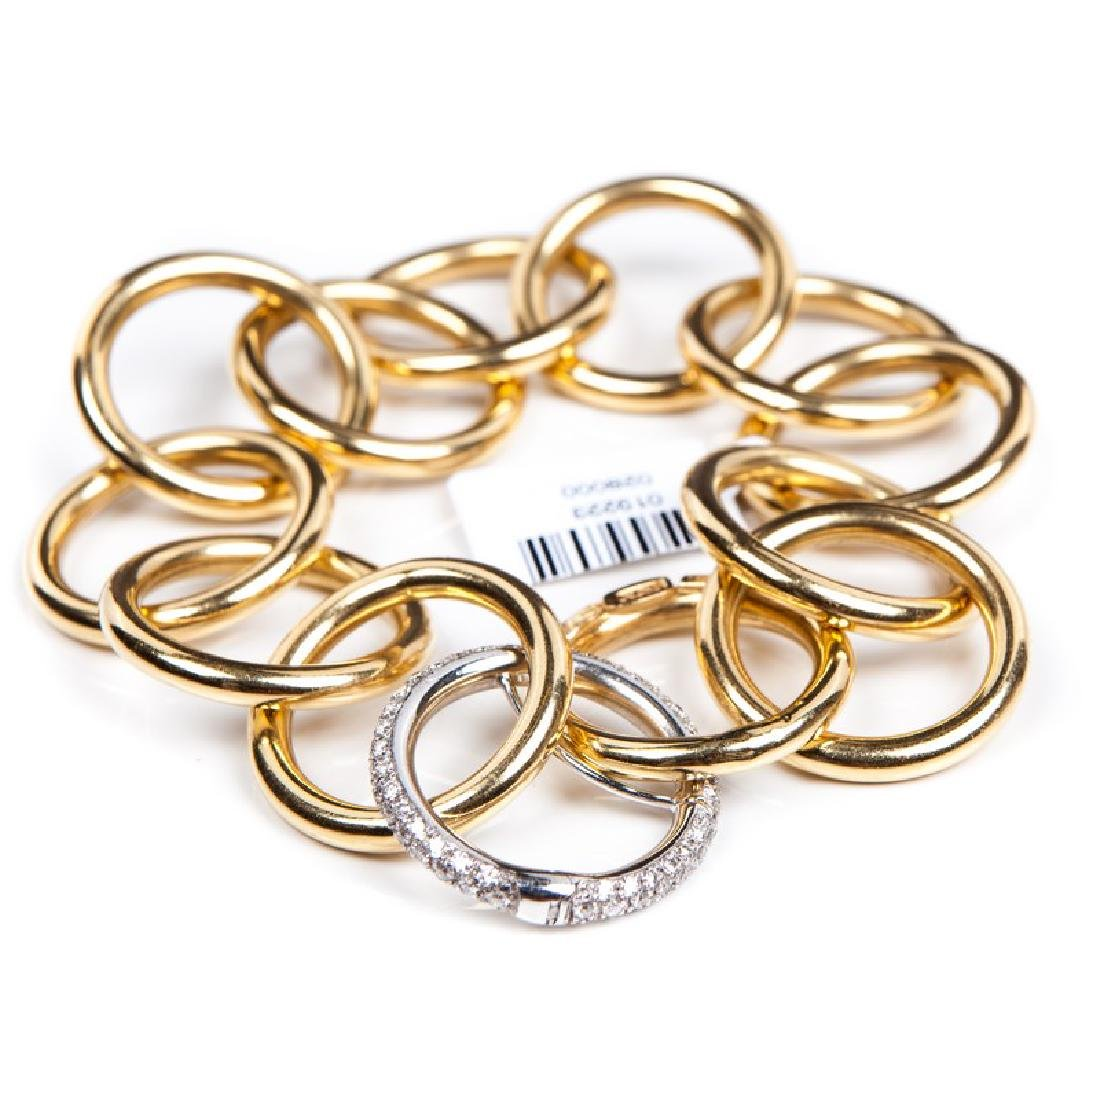 NICOLIS COLA 18 kt YELLOW GOLD & DIAMOND BRACELET